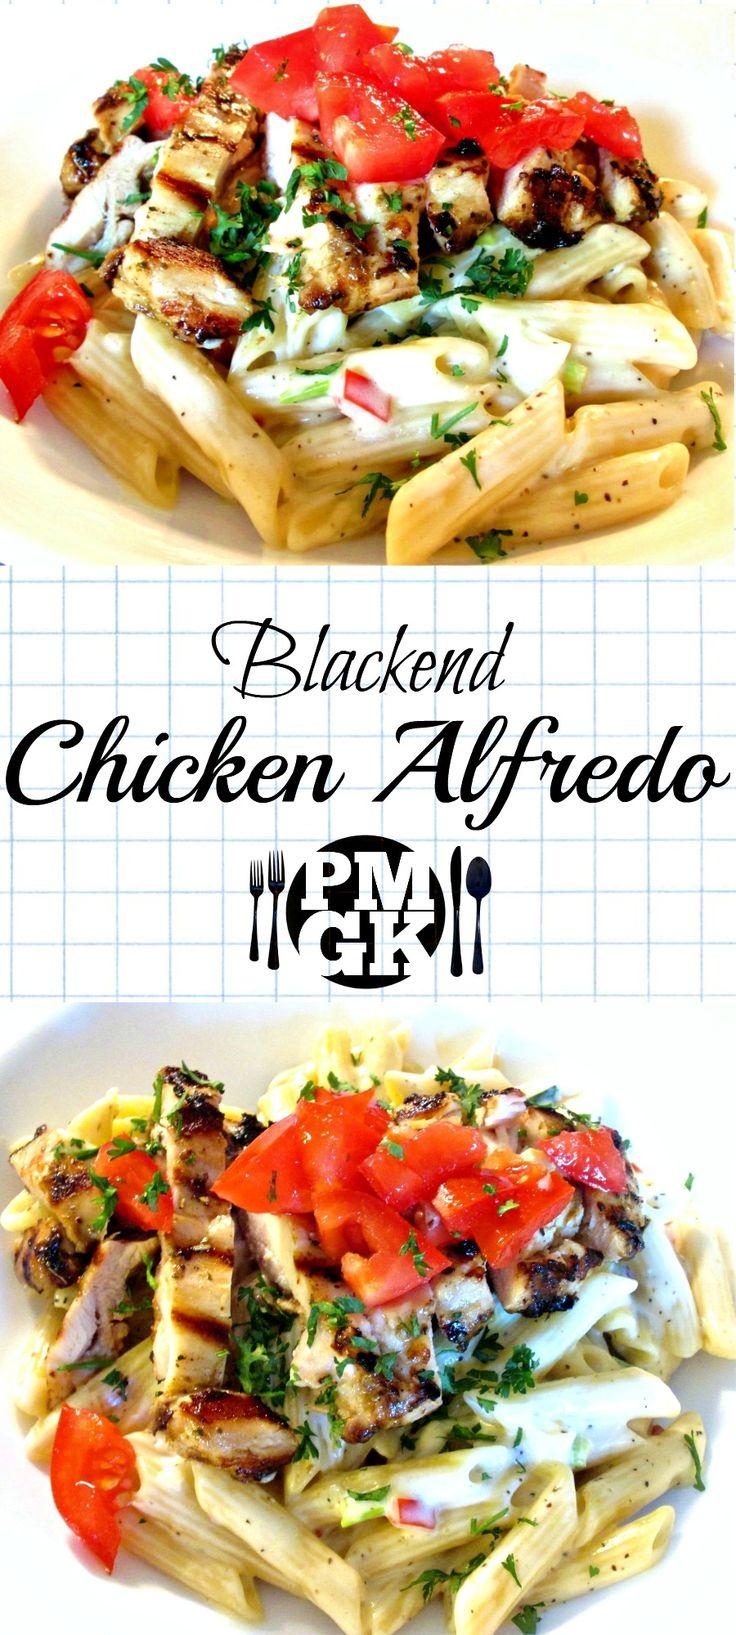 31 best pmgk italian food recipes images on pinterest clock blackened chicken alfredo blackened chicken alfredoalfredo recipecollege recipesitalian food recipesvideo forumfinder Image collections